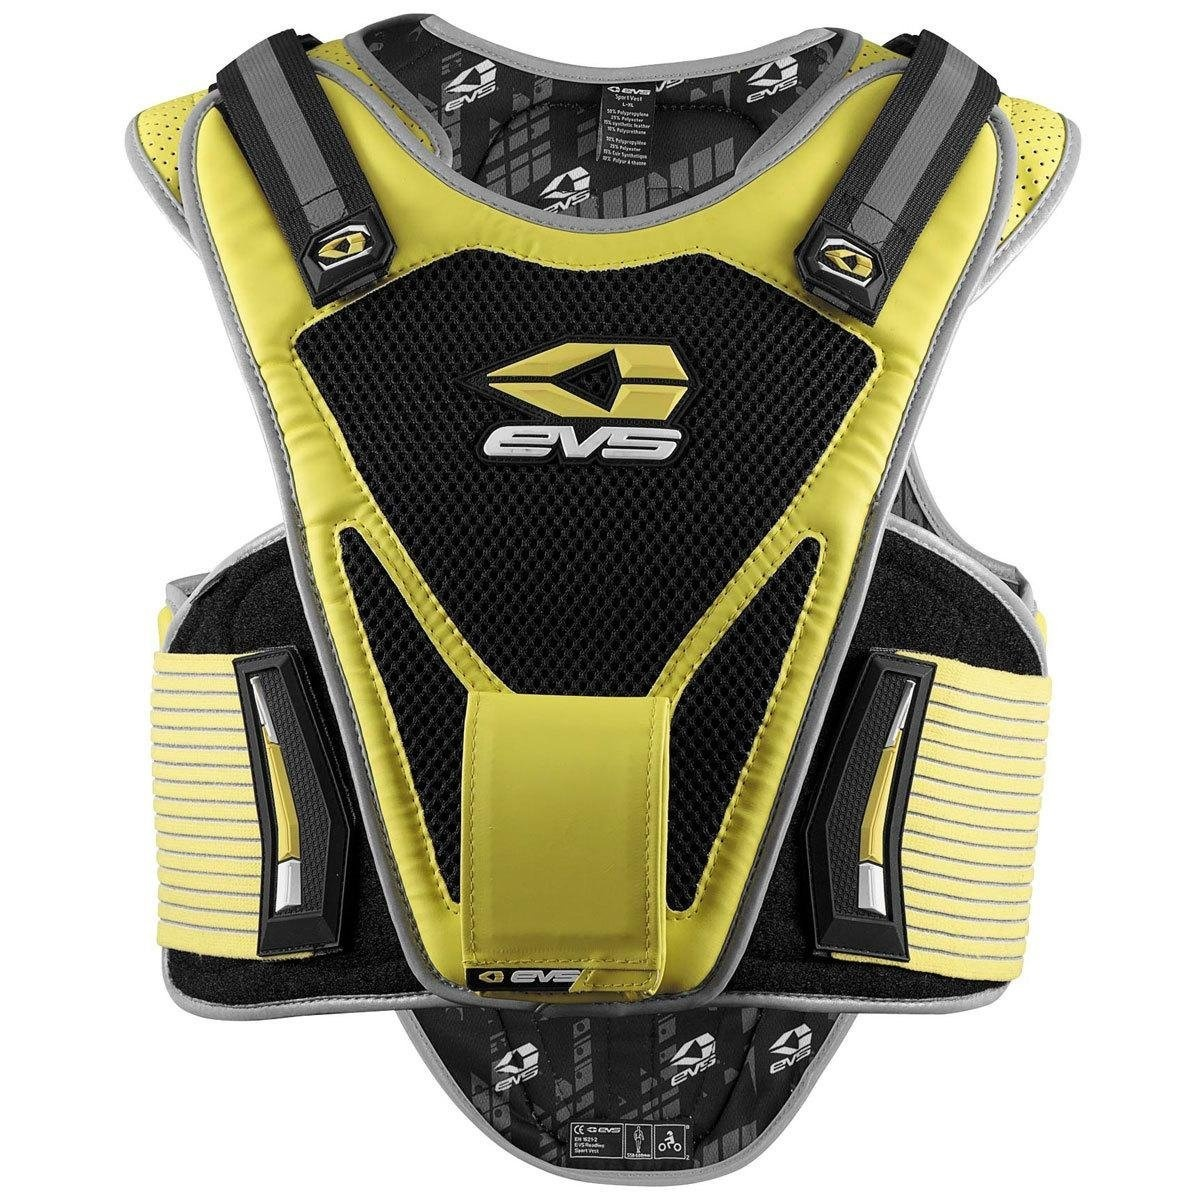 (Small/Medium, Yellow) - EVS Mil-Spec Hi-Viz Sport Vest - Small/Medium